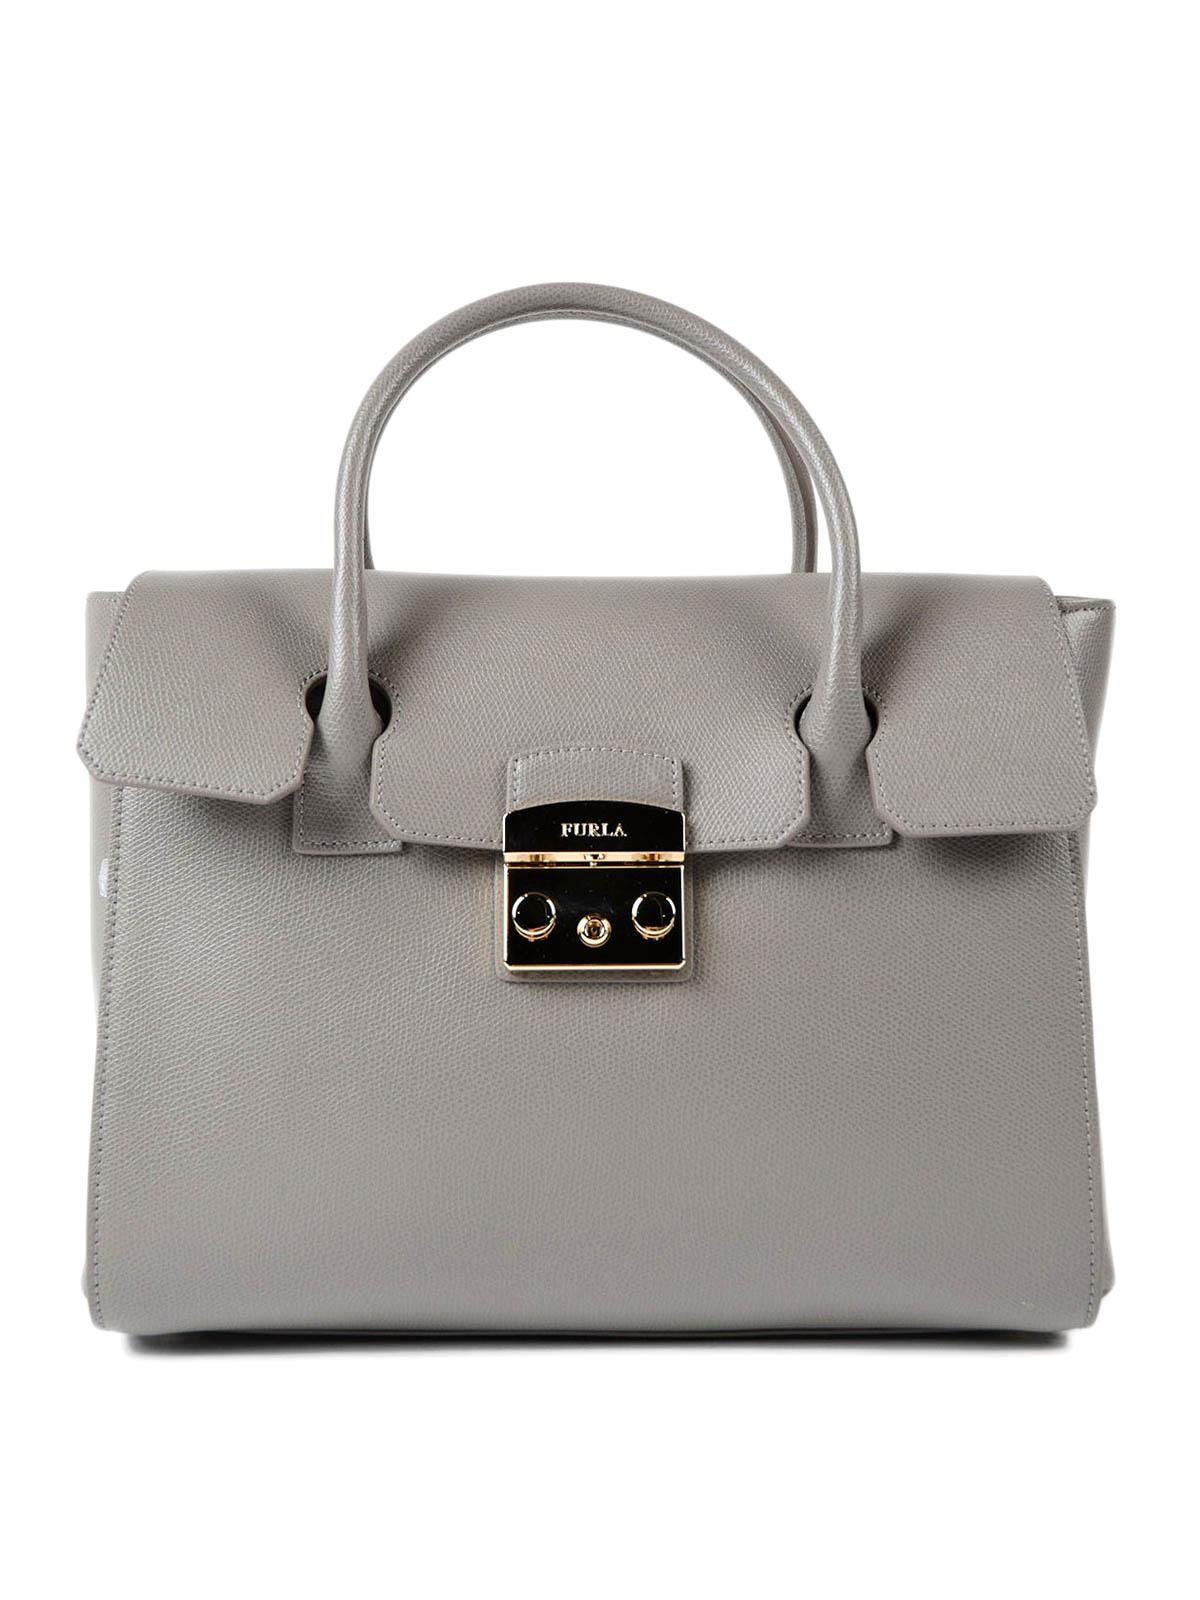 bbdefcd1b Furla - Metropolis M leather tote - totes bags - 903837 | iKRIX.com